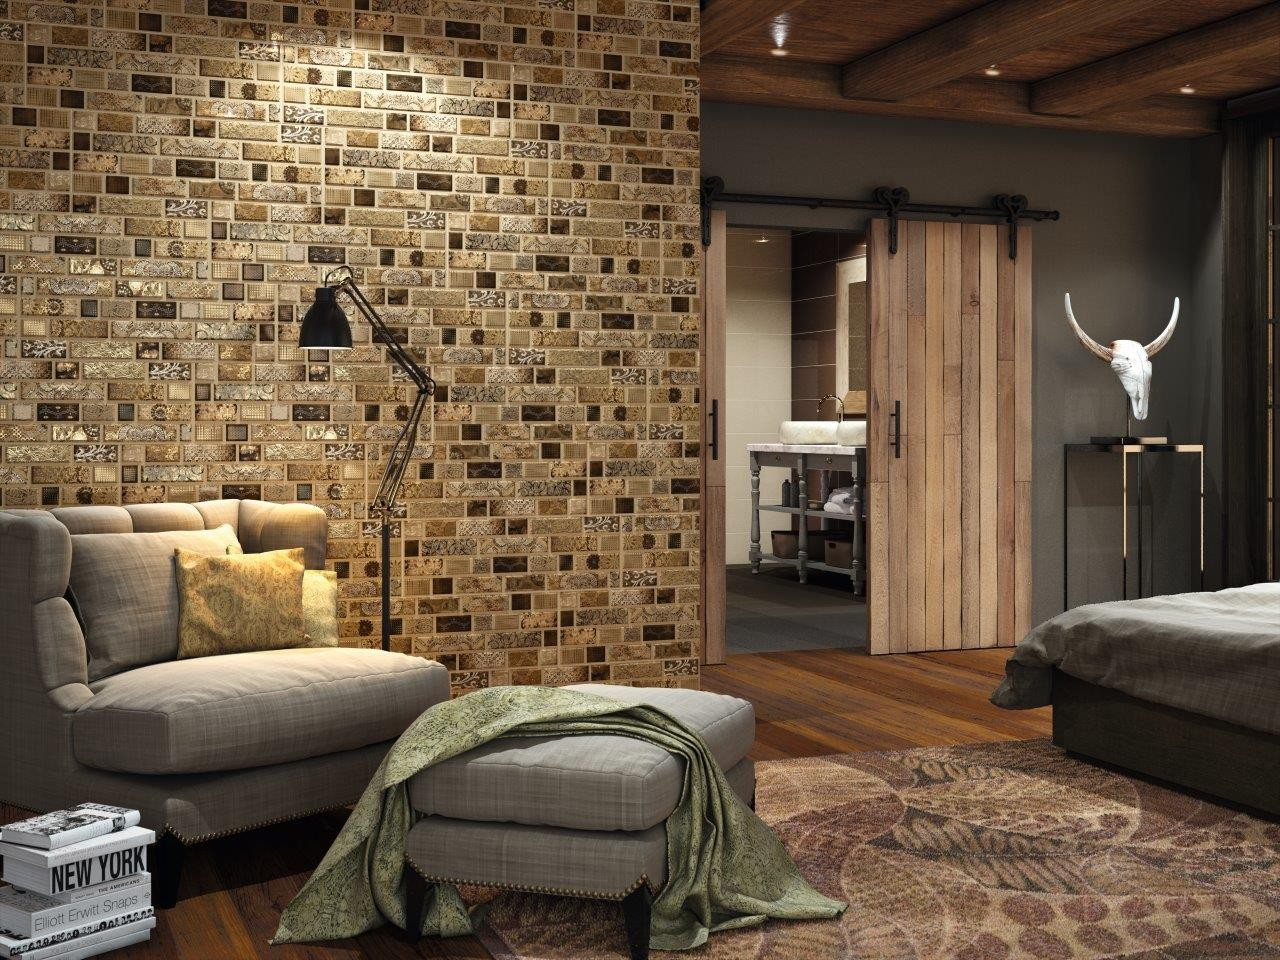 Carisma Brown Ceramic Feature Wall Brick Effect Tile